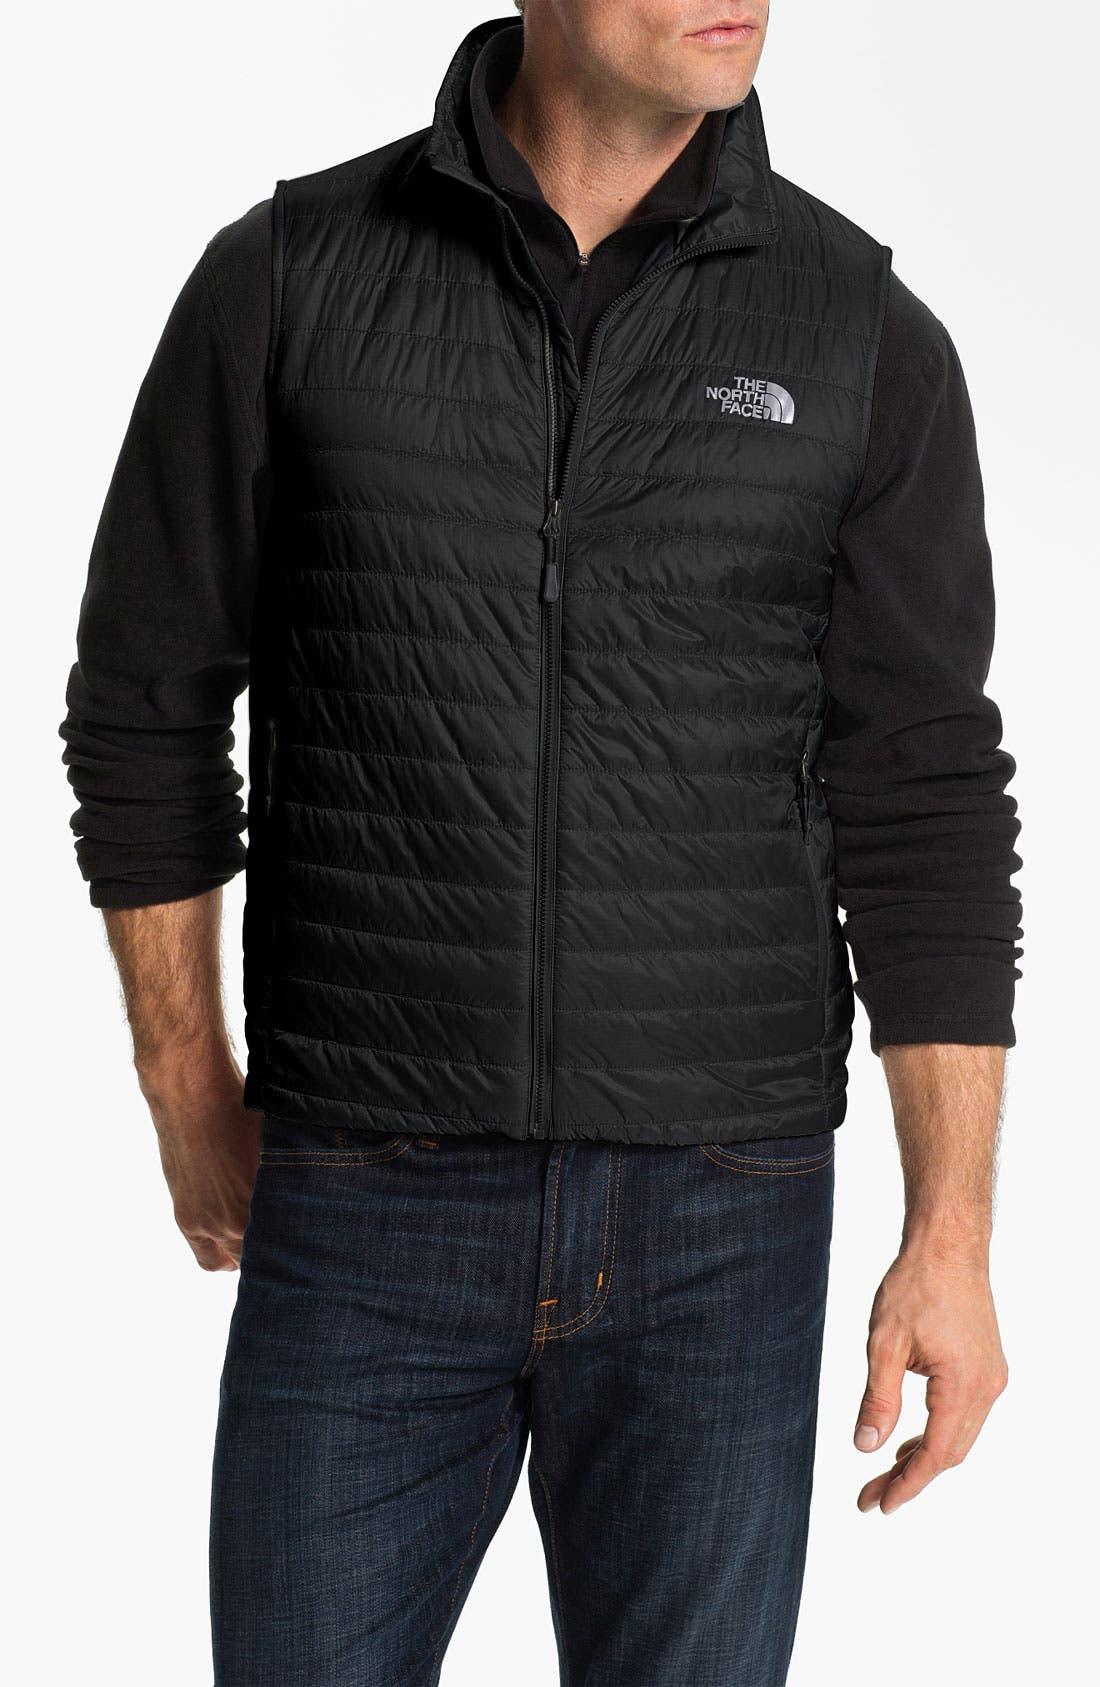 Alternate Image 1 Selected - The North Face 'Blaze' Vest